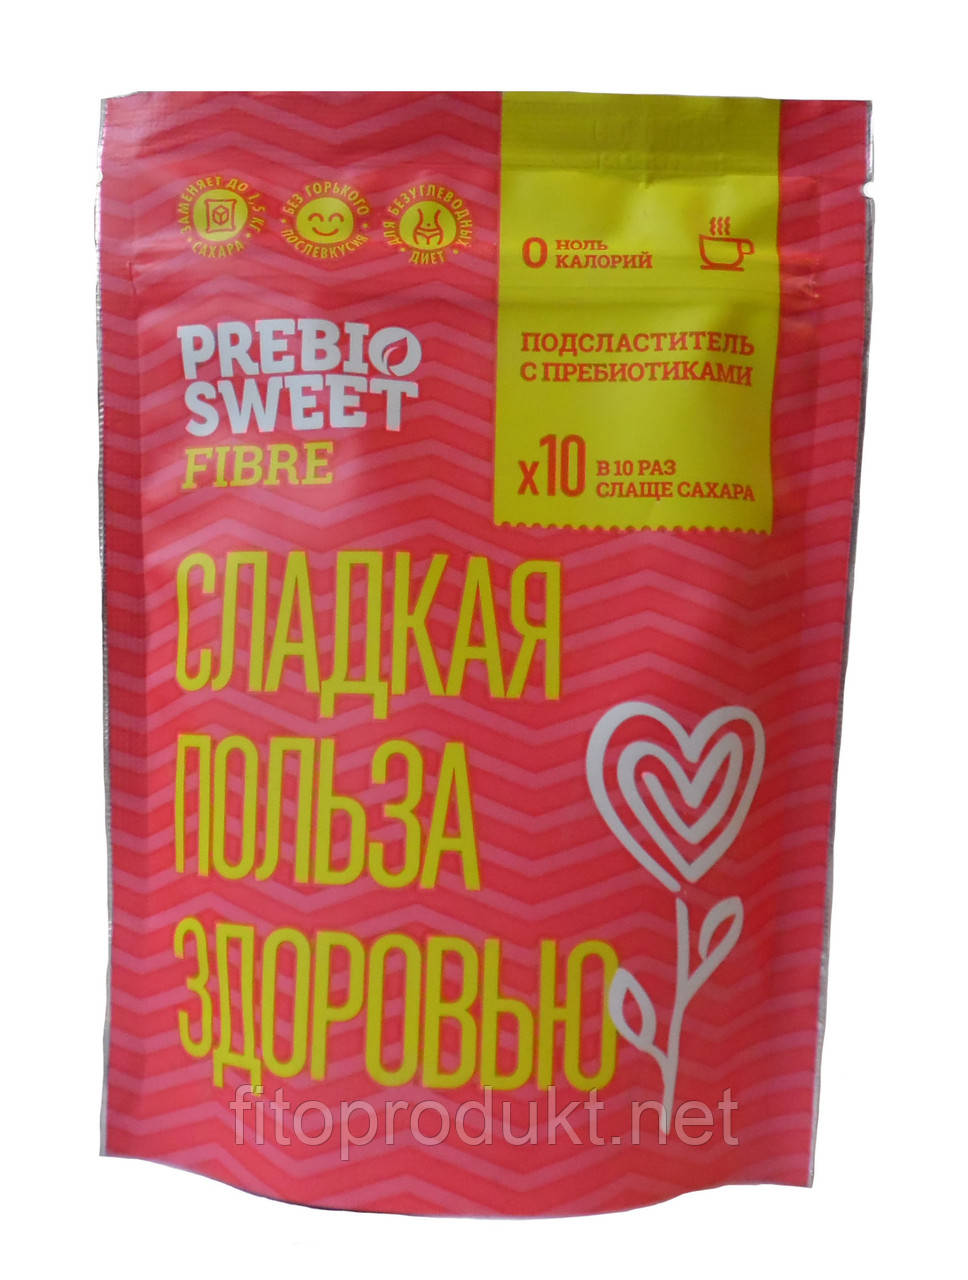 PrebioSweet  Fibre для фанатов здорового питания 150 г Фелицата